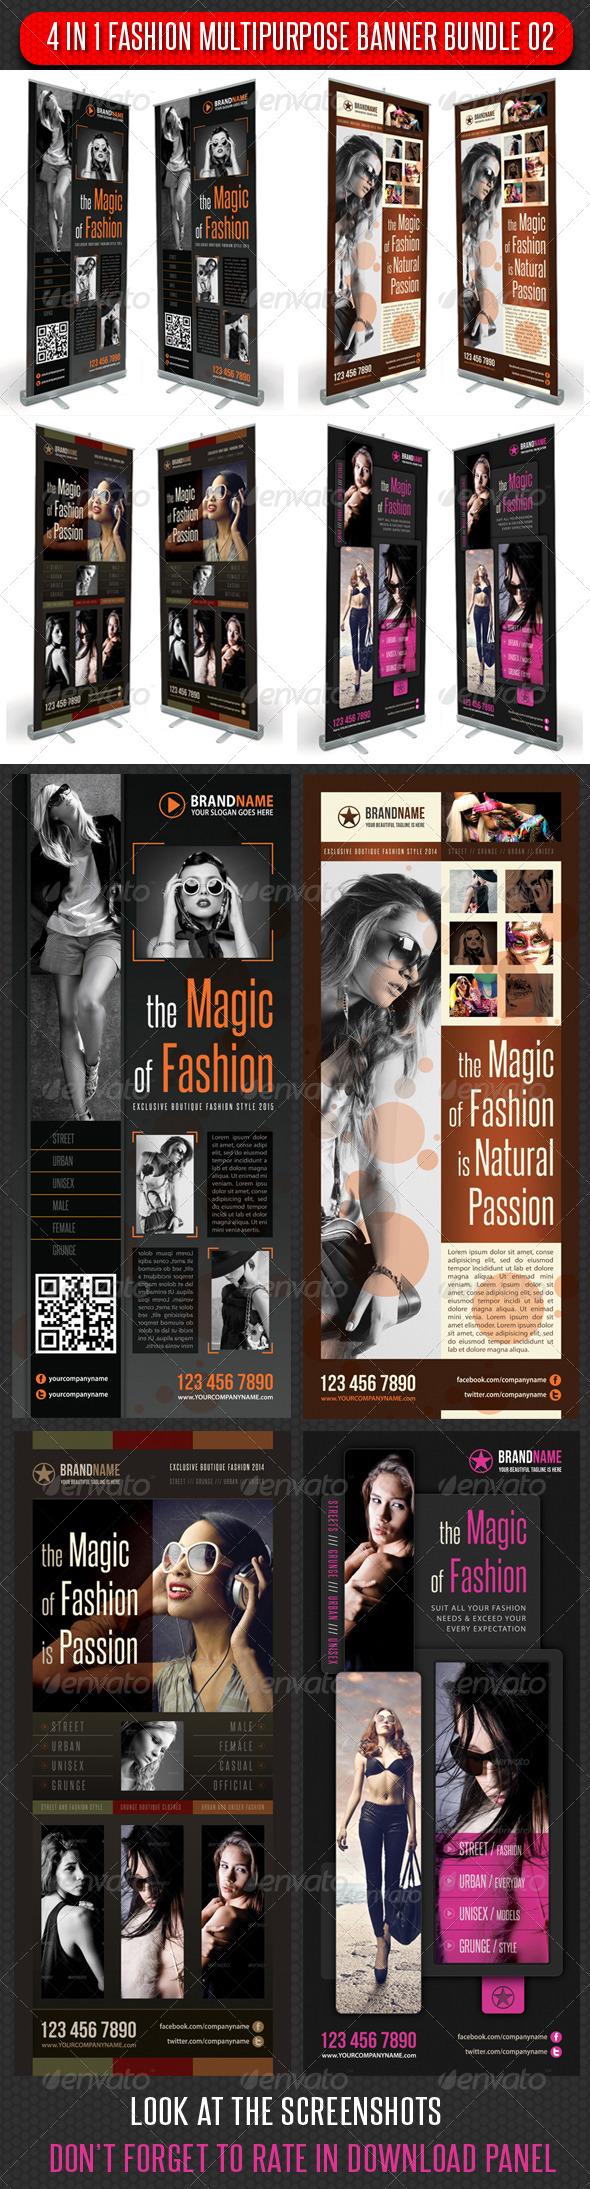 4 in 1 Fashion Multipurpose Banner Bundle 03 - Signage Print Templates